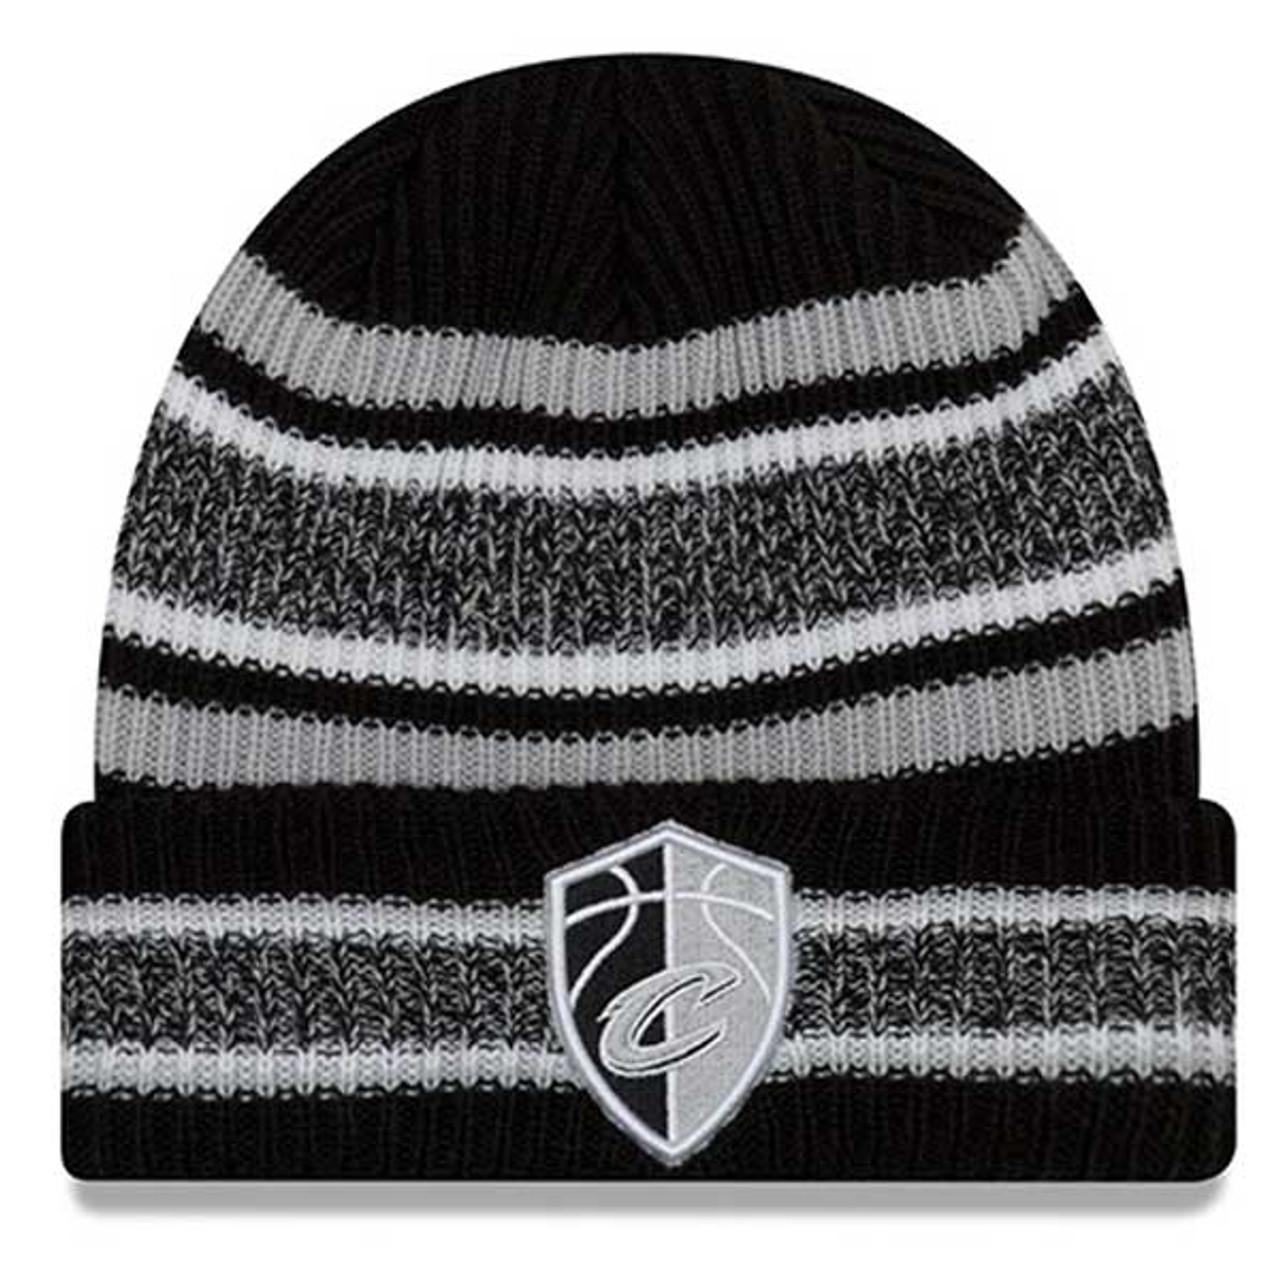 04a6d30009e Vintage Stripe Knit Hat